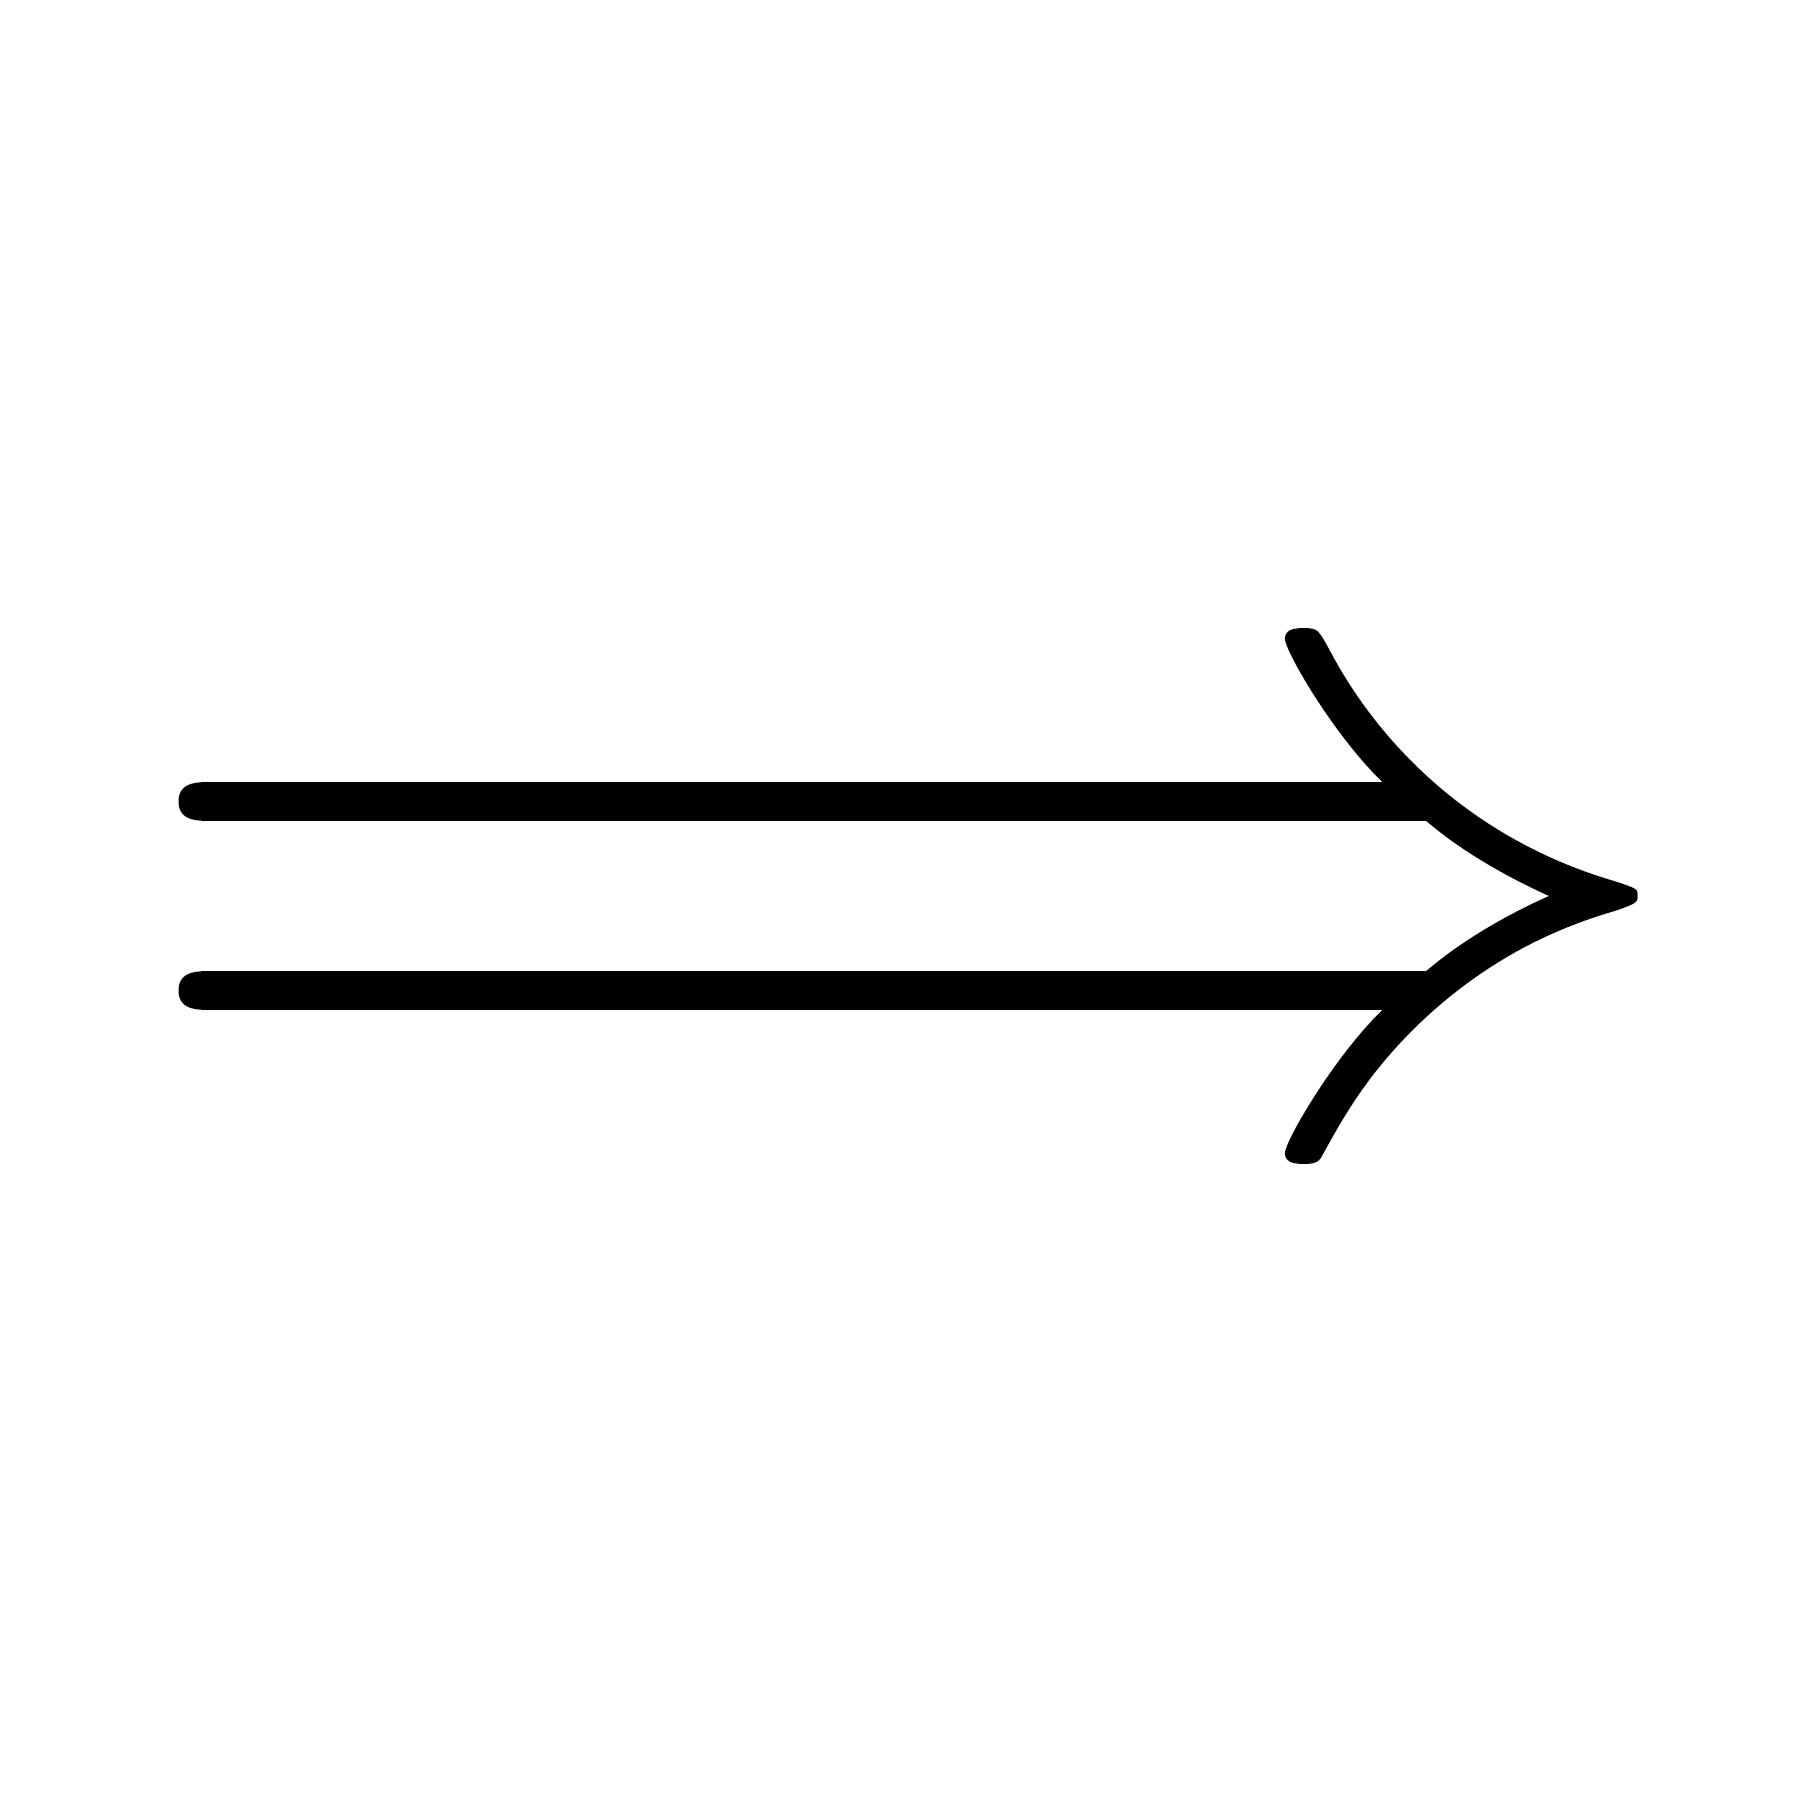 Logical implication symbol